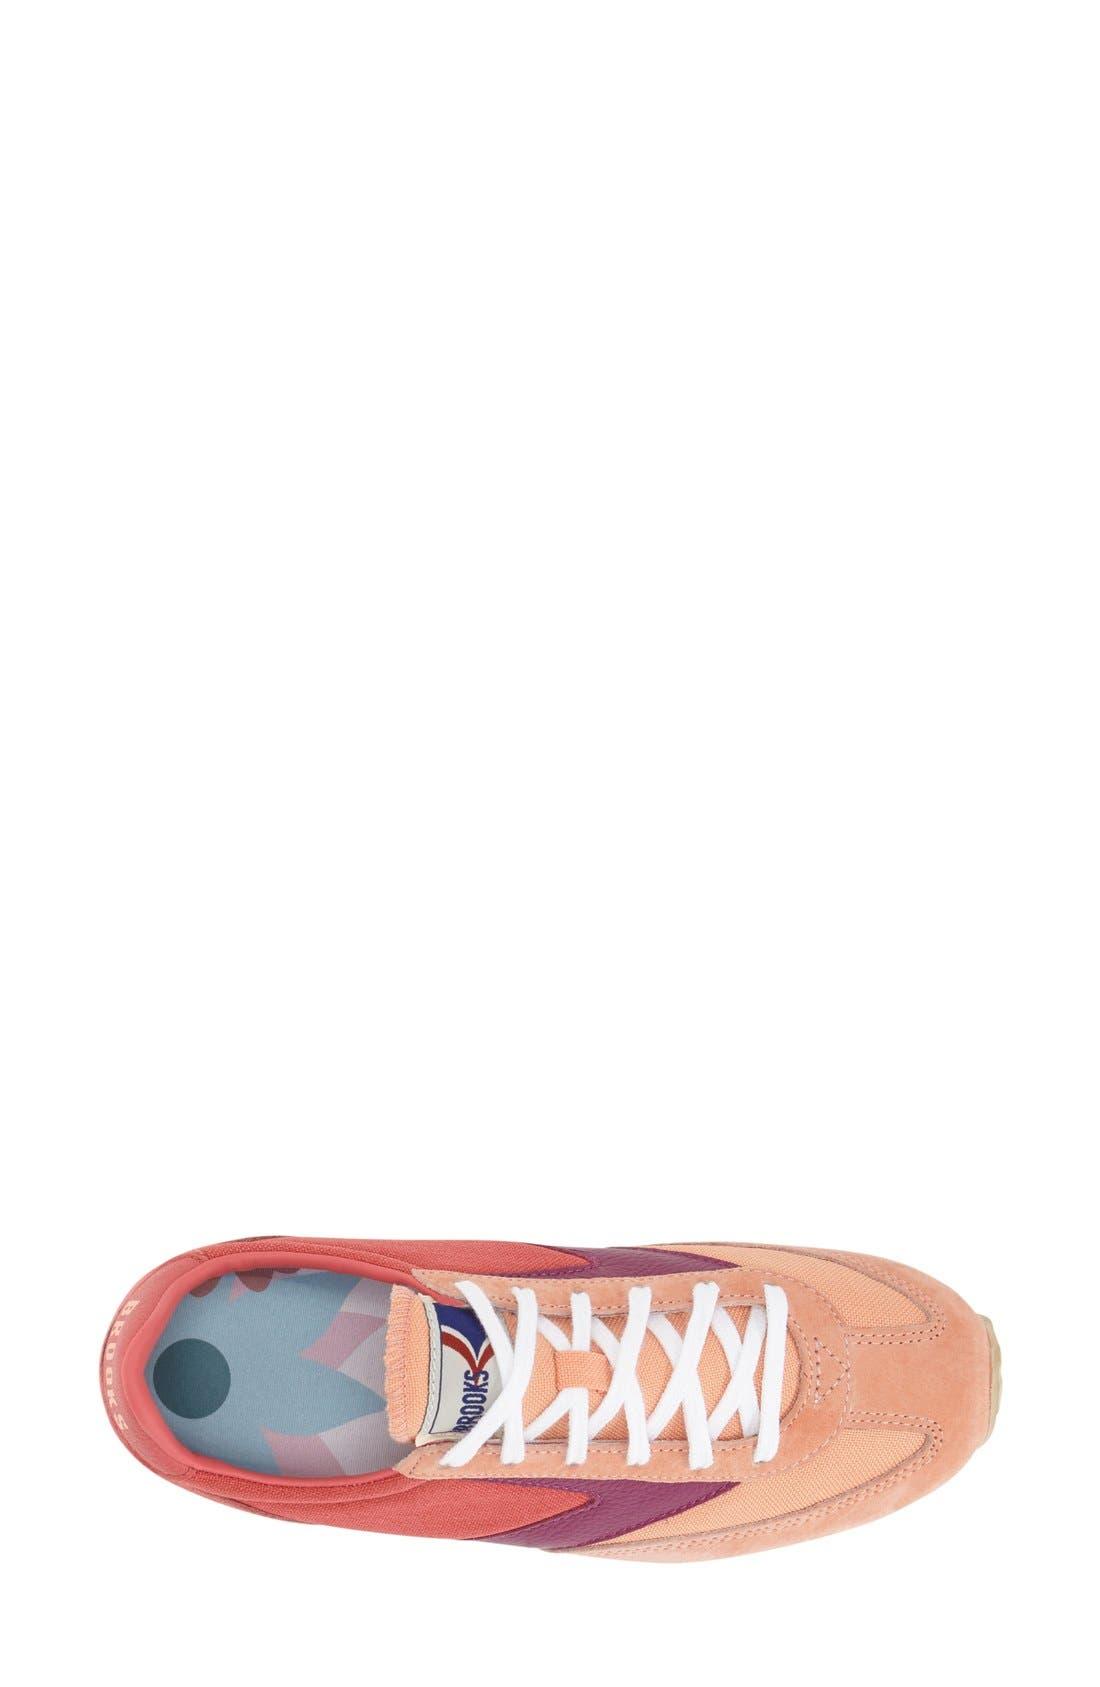 'Vanguard' Sneaker,                             Alternate thumbnail 93, color,